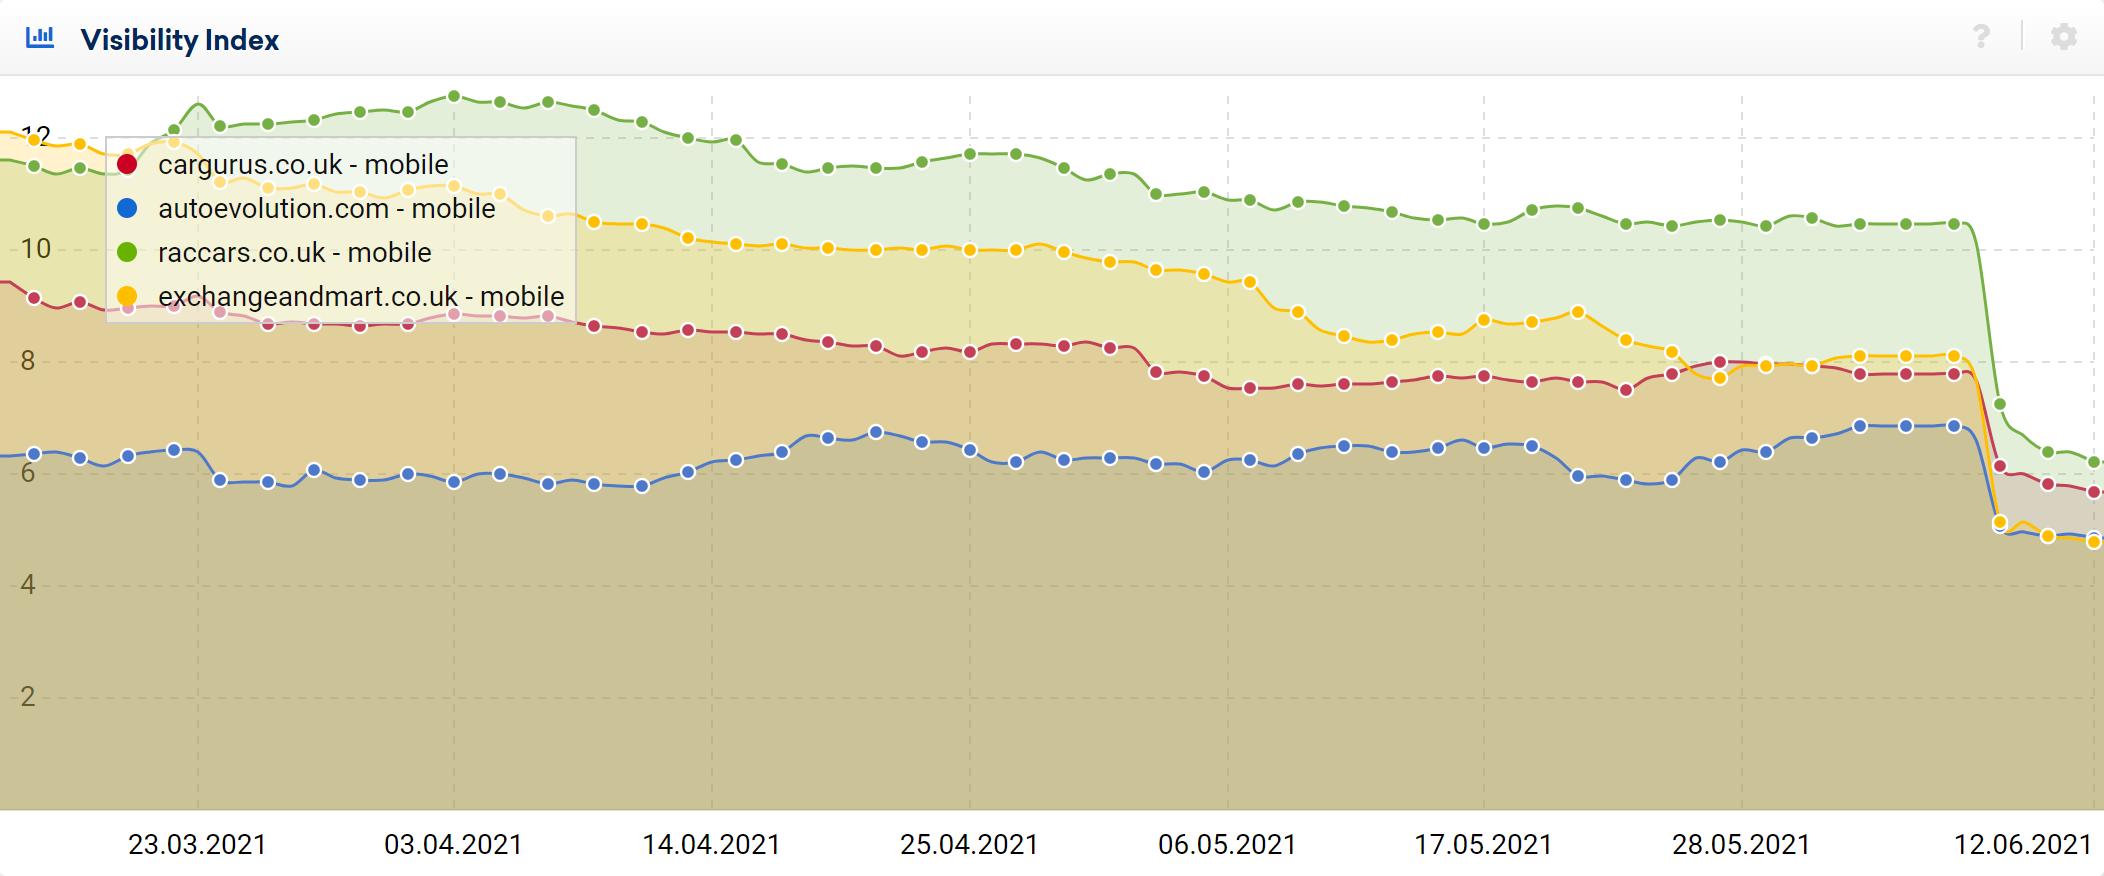 Visibility Index graphs for car sales sites